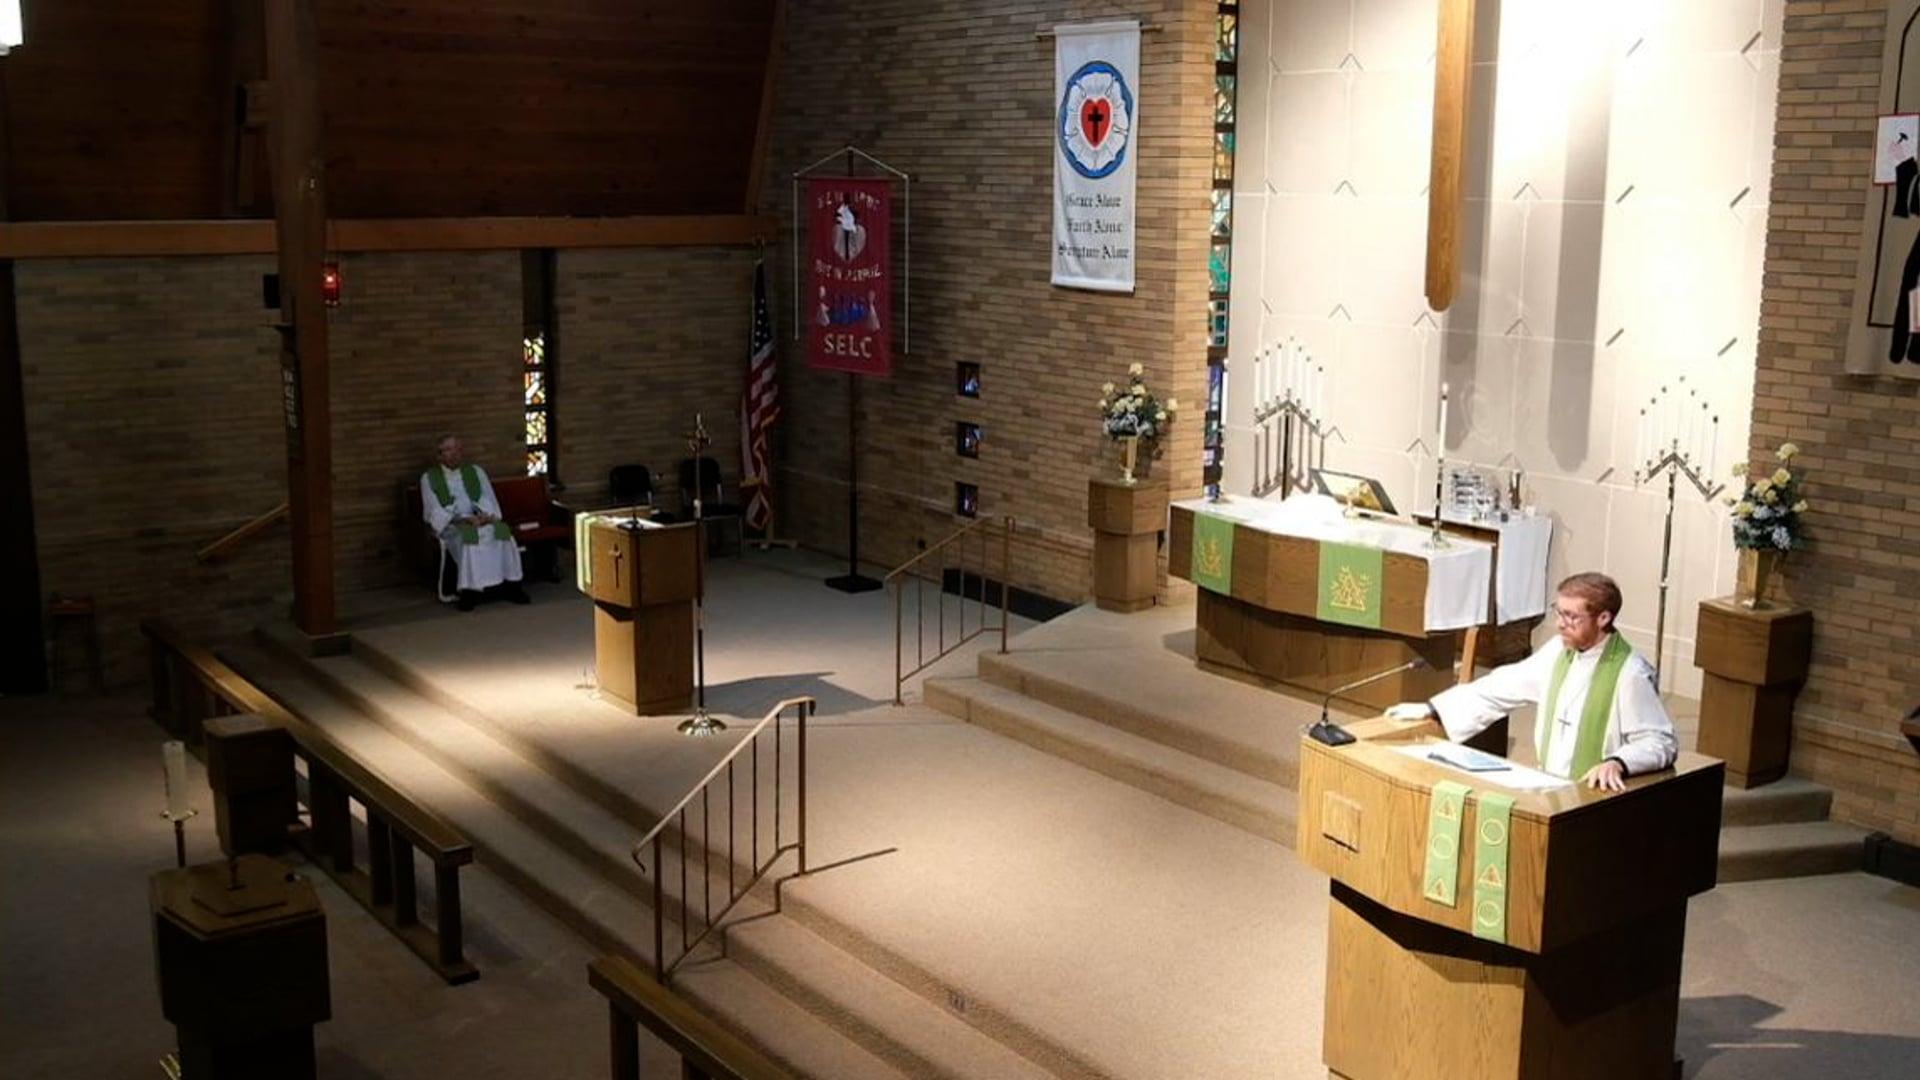 Divine Service, 21st Sunday after Pentecost